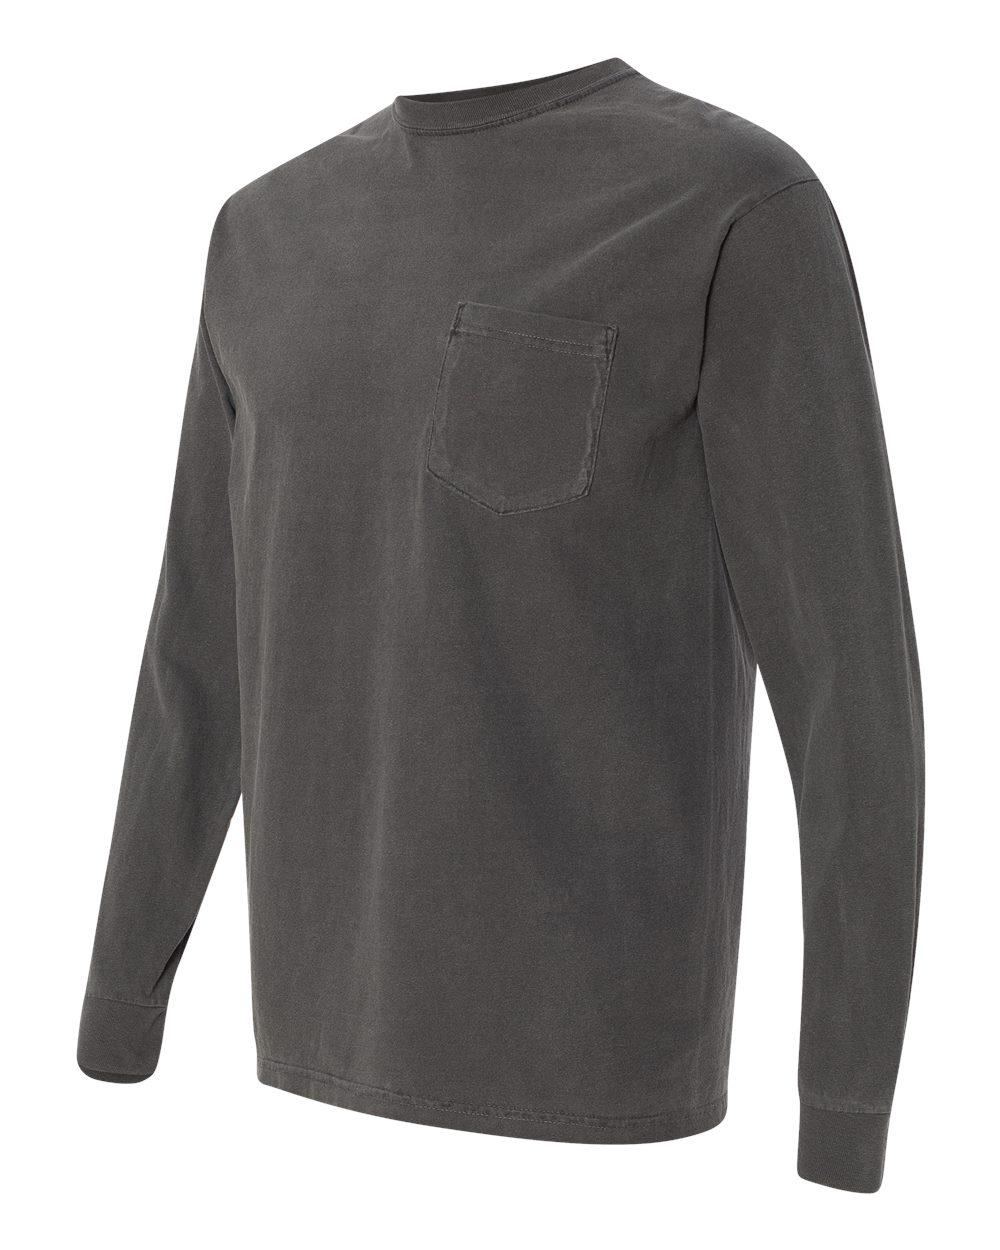 Comfort-Colors-Men-039-s-6-1-oz-Long-Sleeve-Pocket-T-Shirt-C4410-S-3XL thumbnail 32